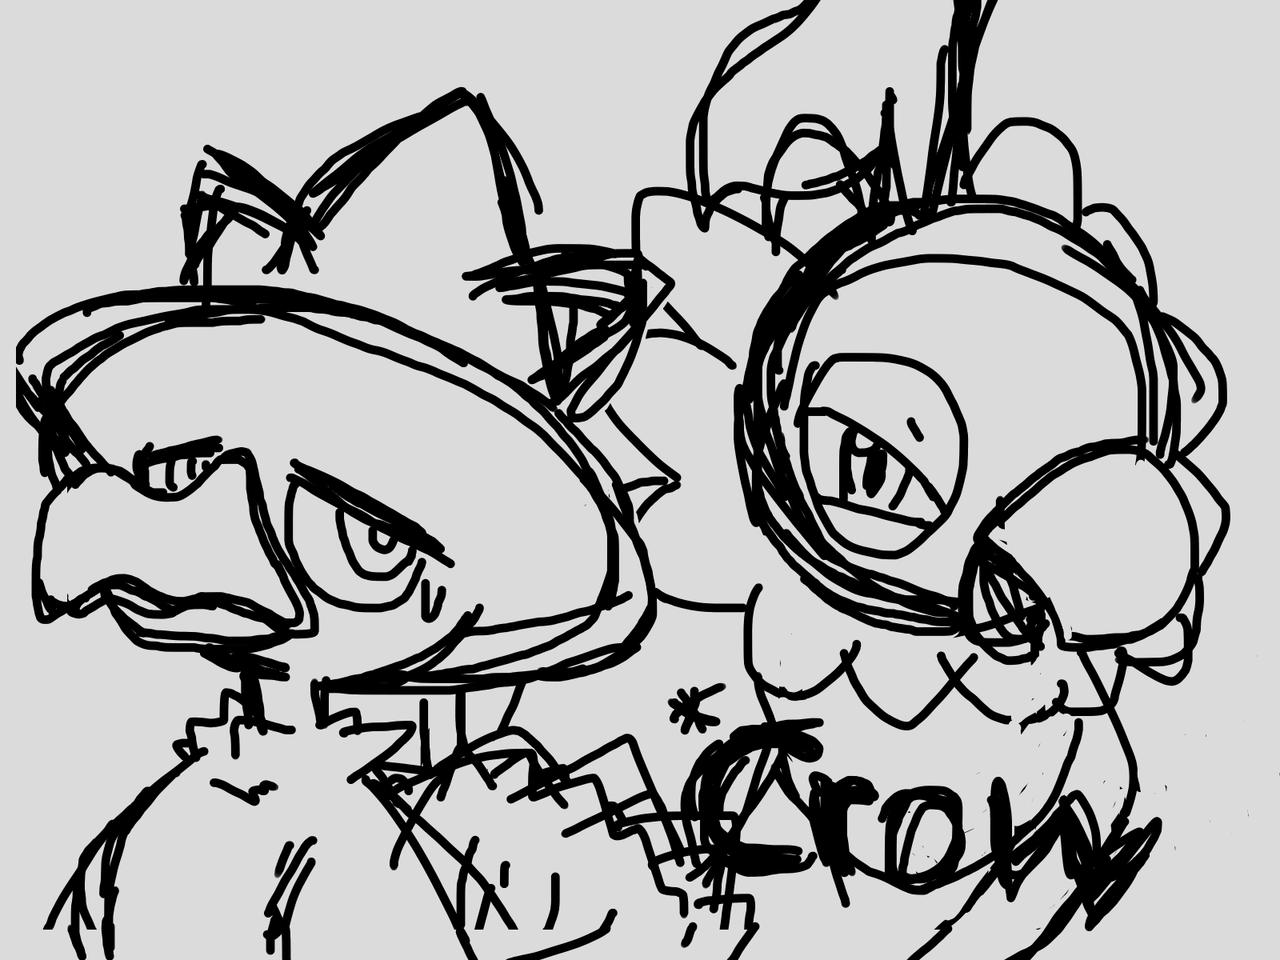 Chatot And Murkrow Illust of PepeArt Post_Multiple_Images_Contest game fanart ペラップ green medibangpaint original ヤミカラス pokemon